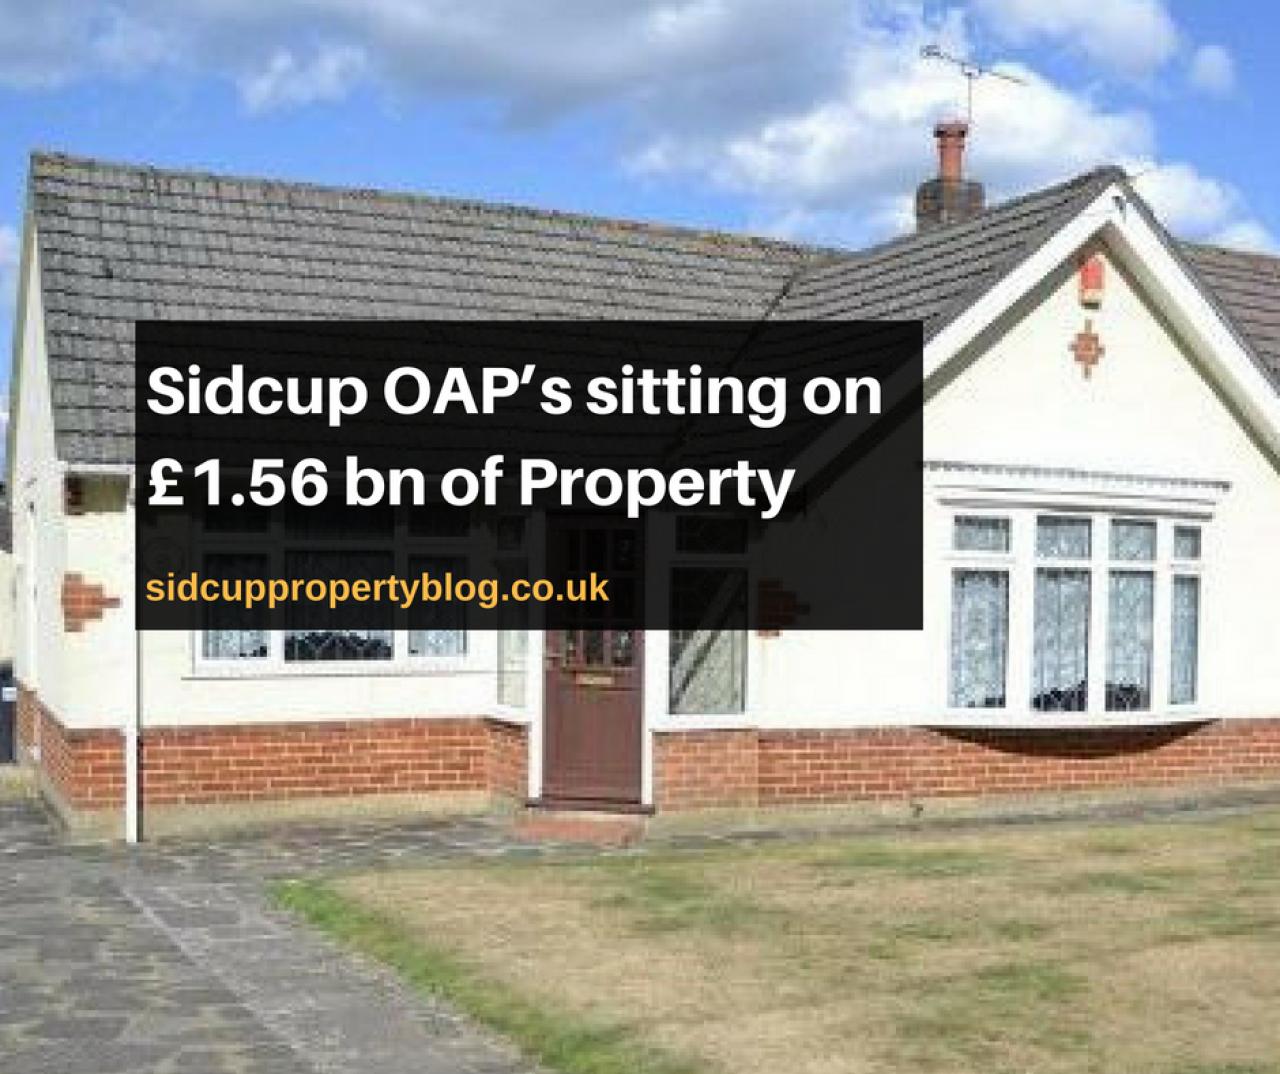 >Sidcup OAP's sitting on